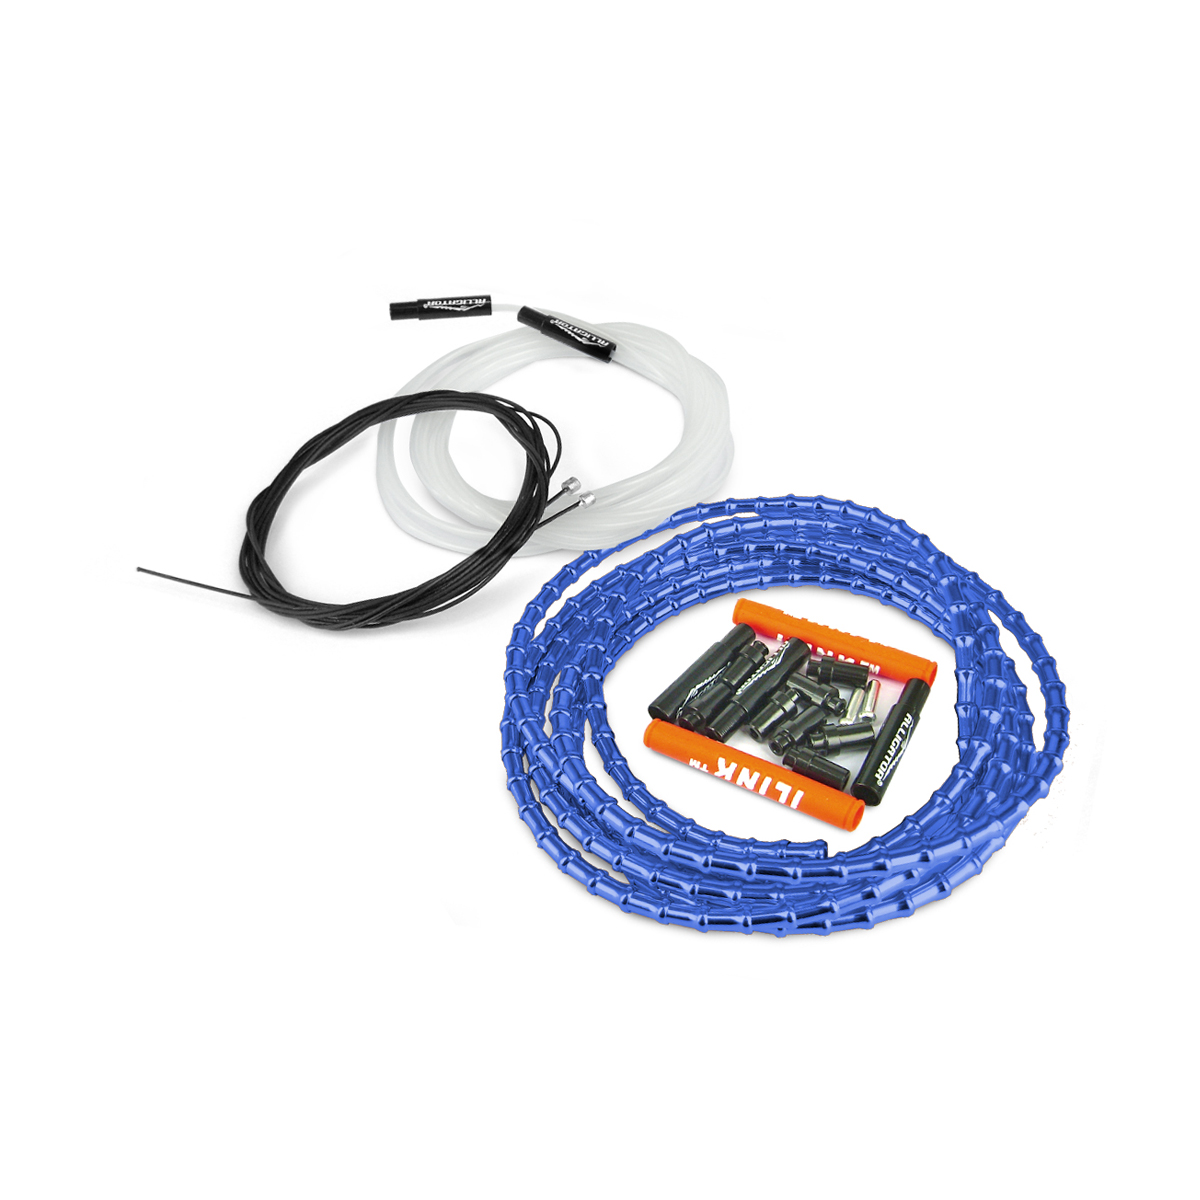 Kit Alligator ILINK dérailleur Bleu